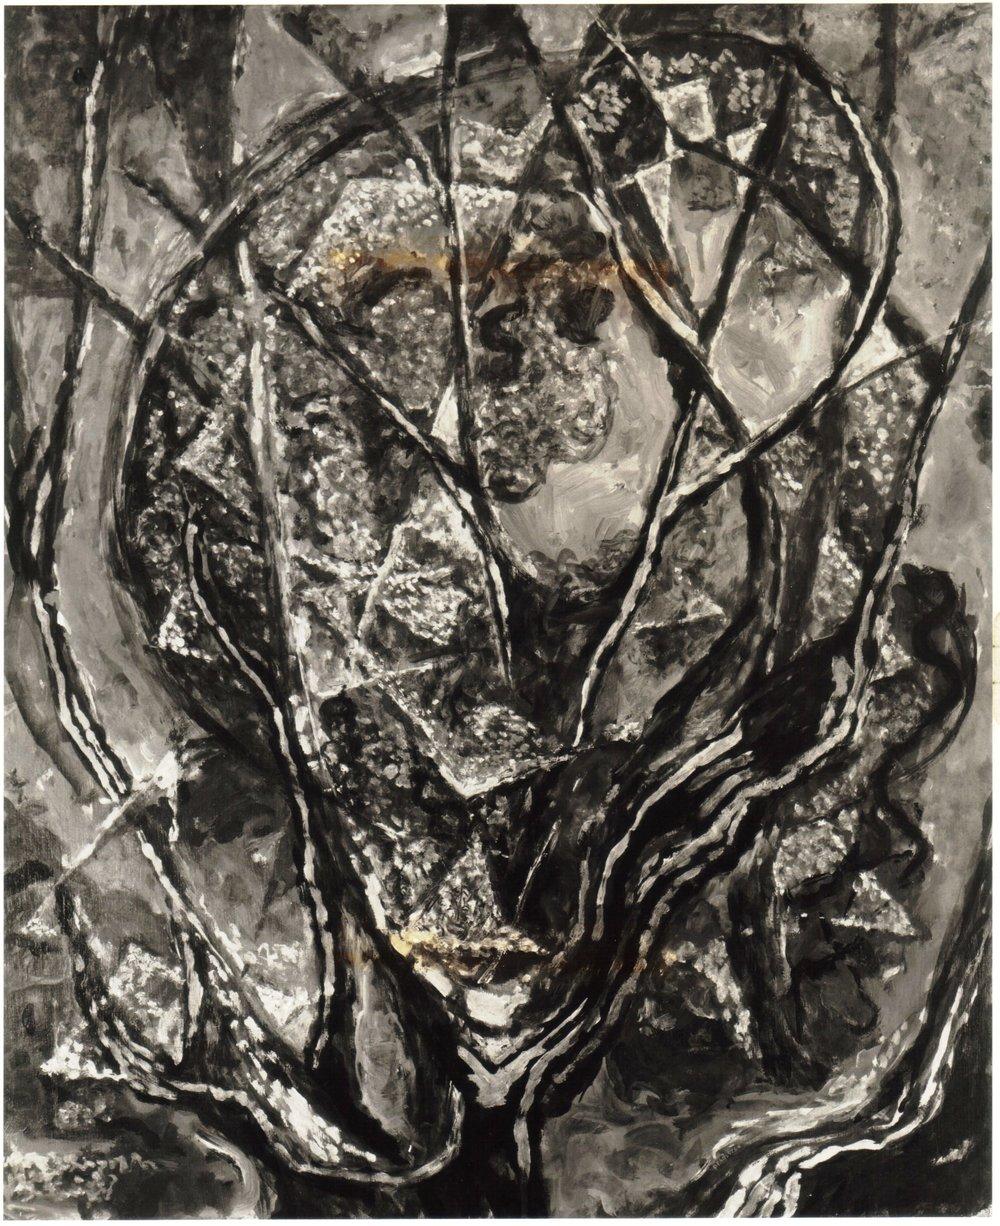 27. 1948, Tree Branches, Casein on Masonite, 30x25, 1948.jpg